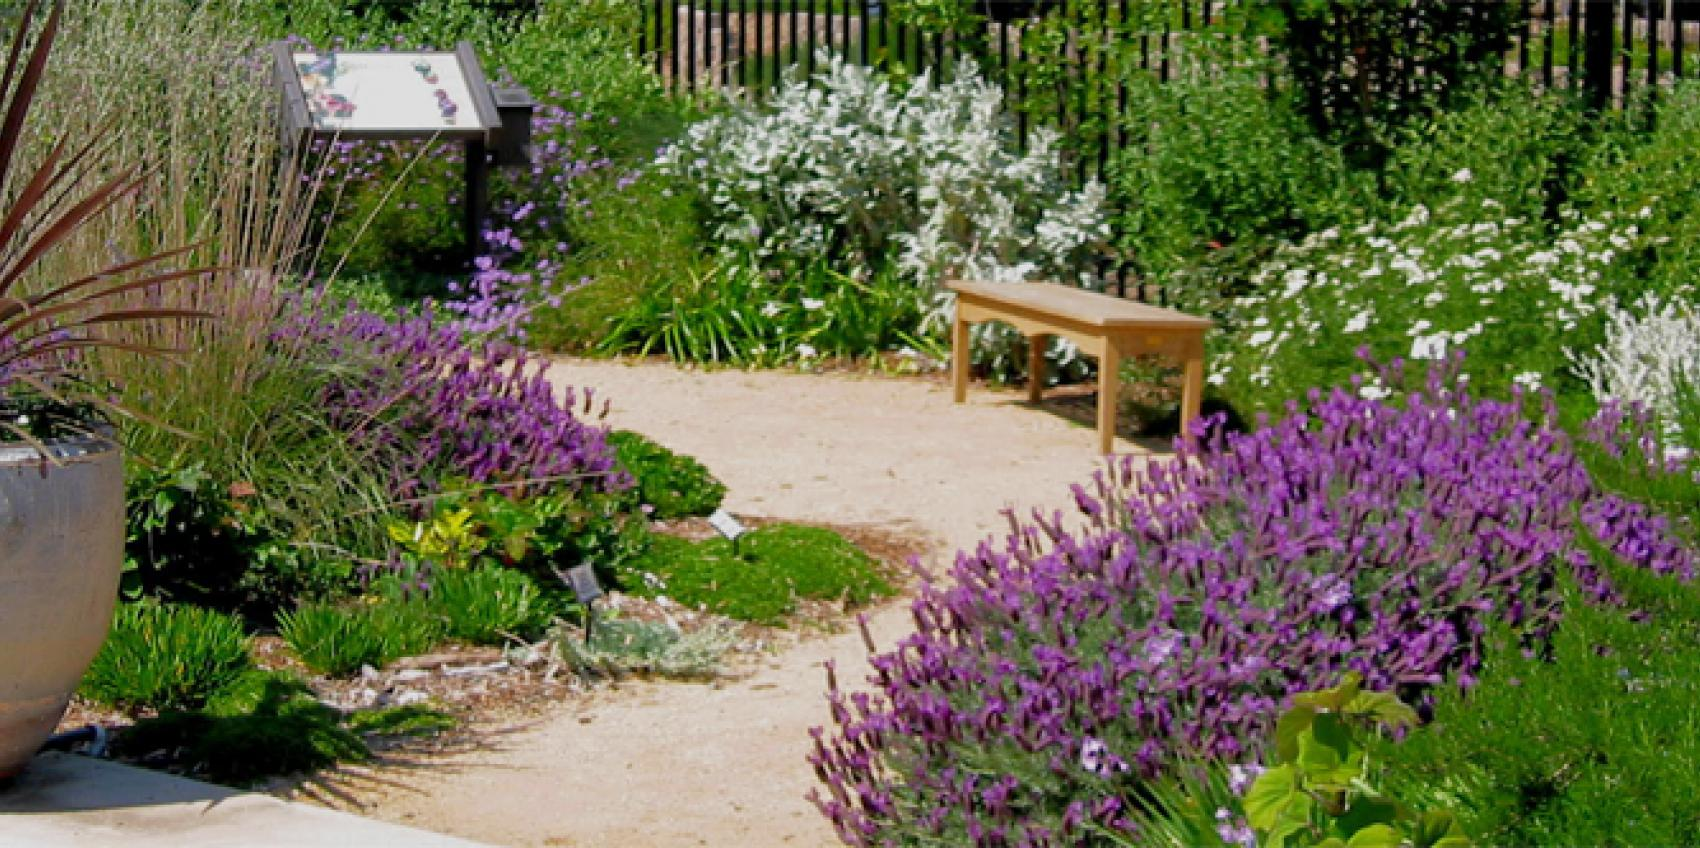 UC Davis Arboretum And Public Garden | American Public Gardens ... on